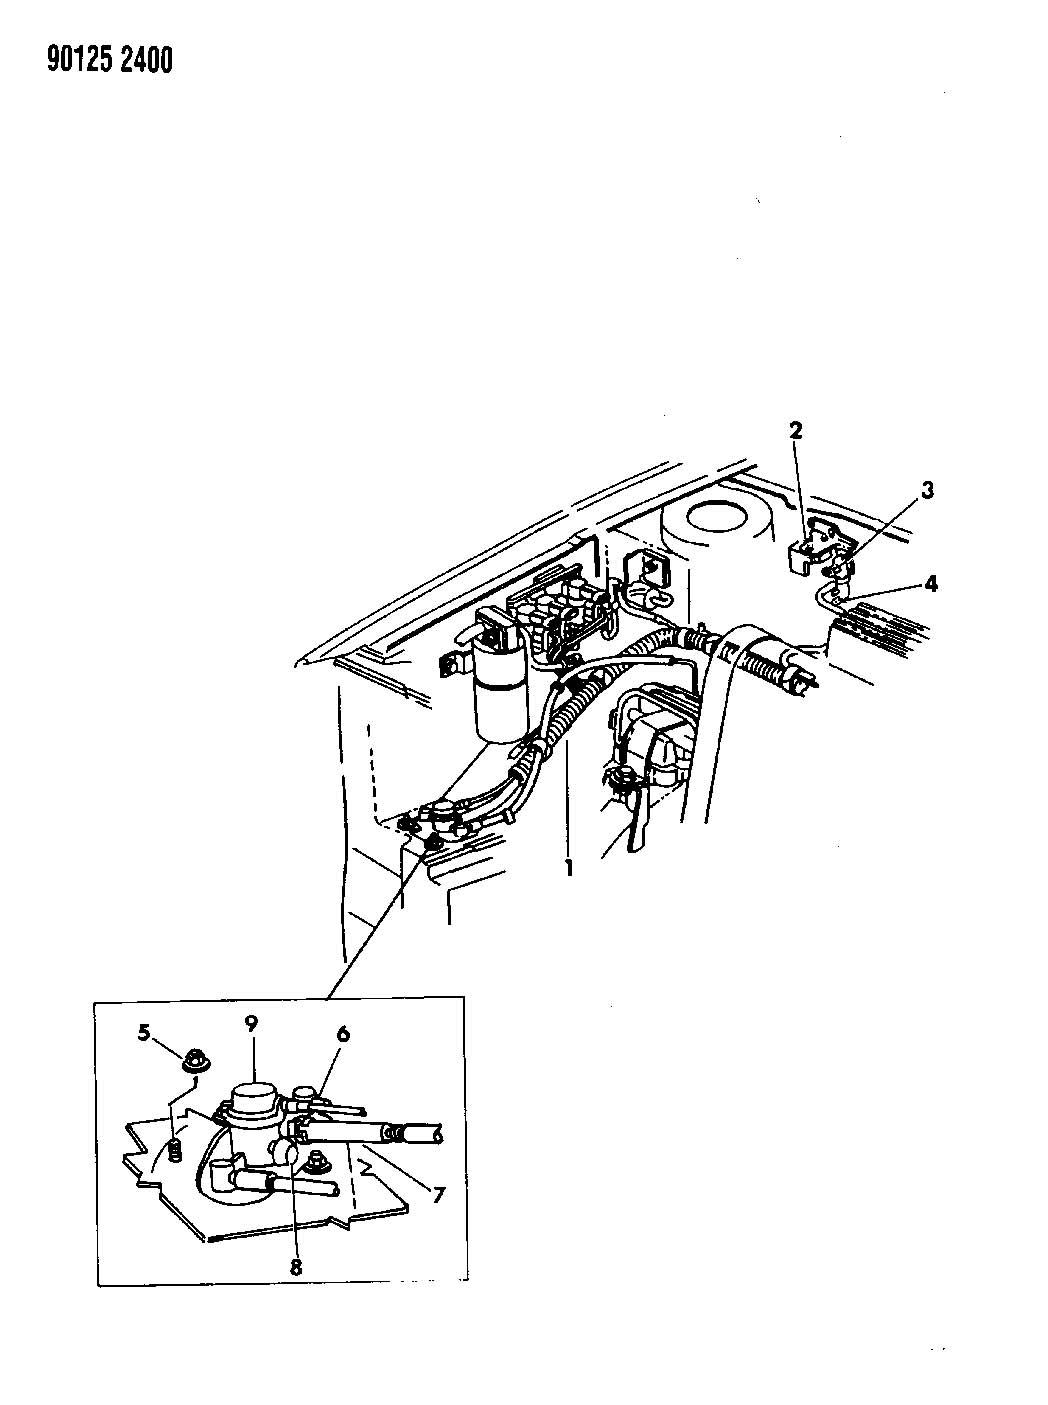 plymouth sundance 2 5l turbo i